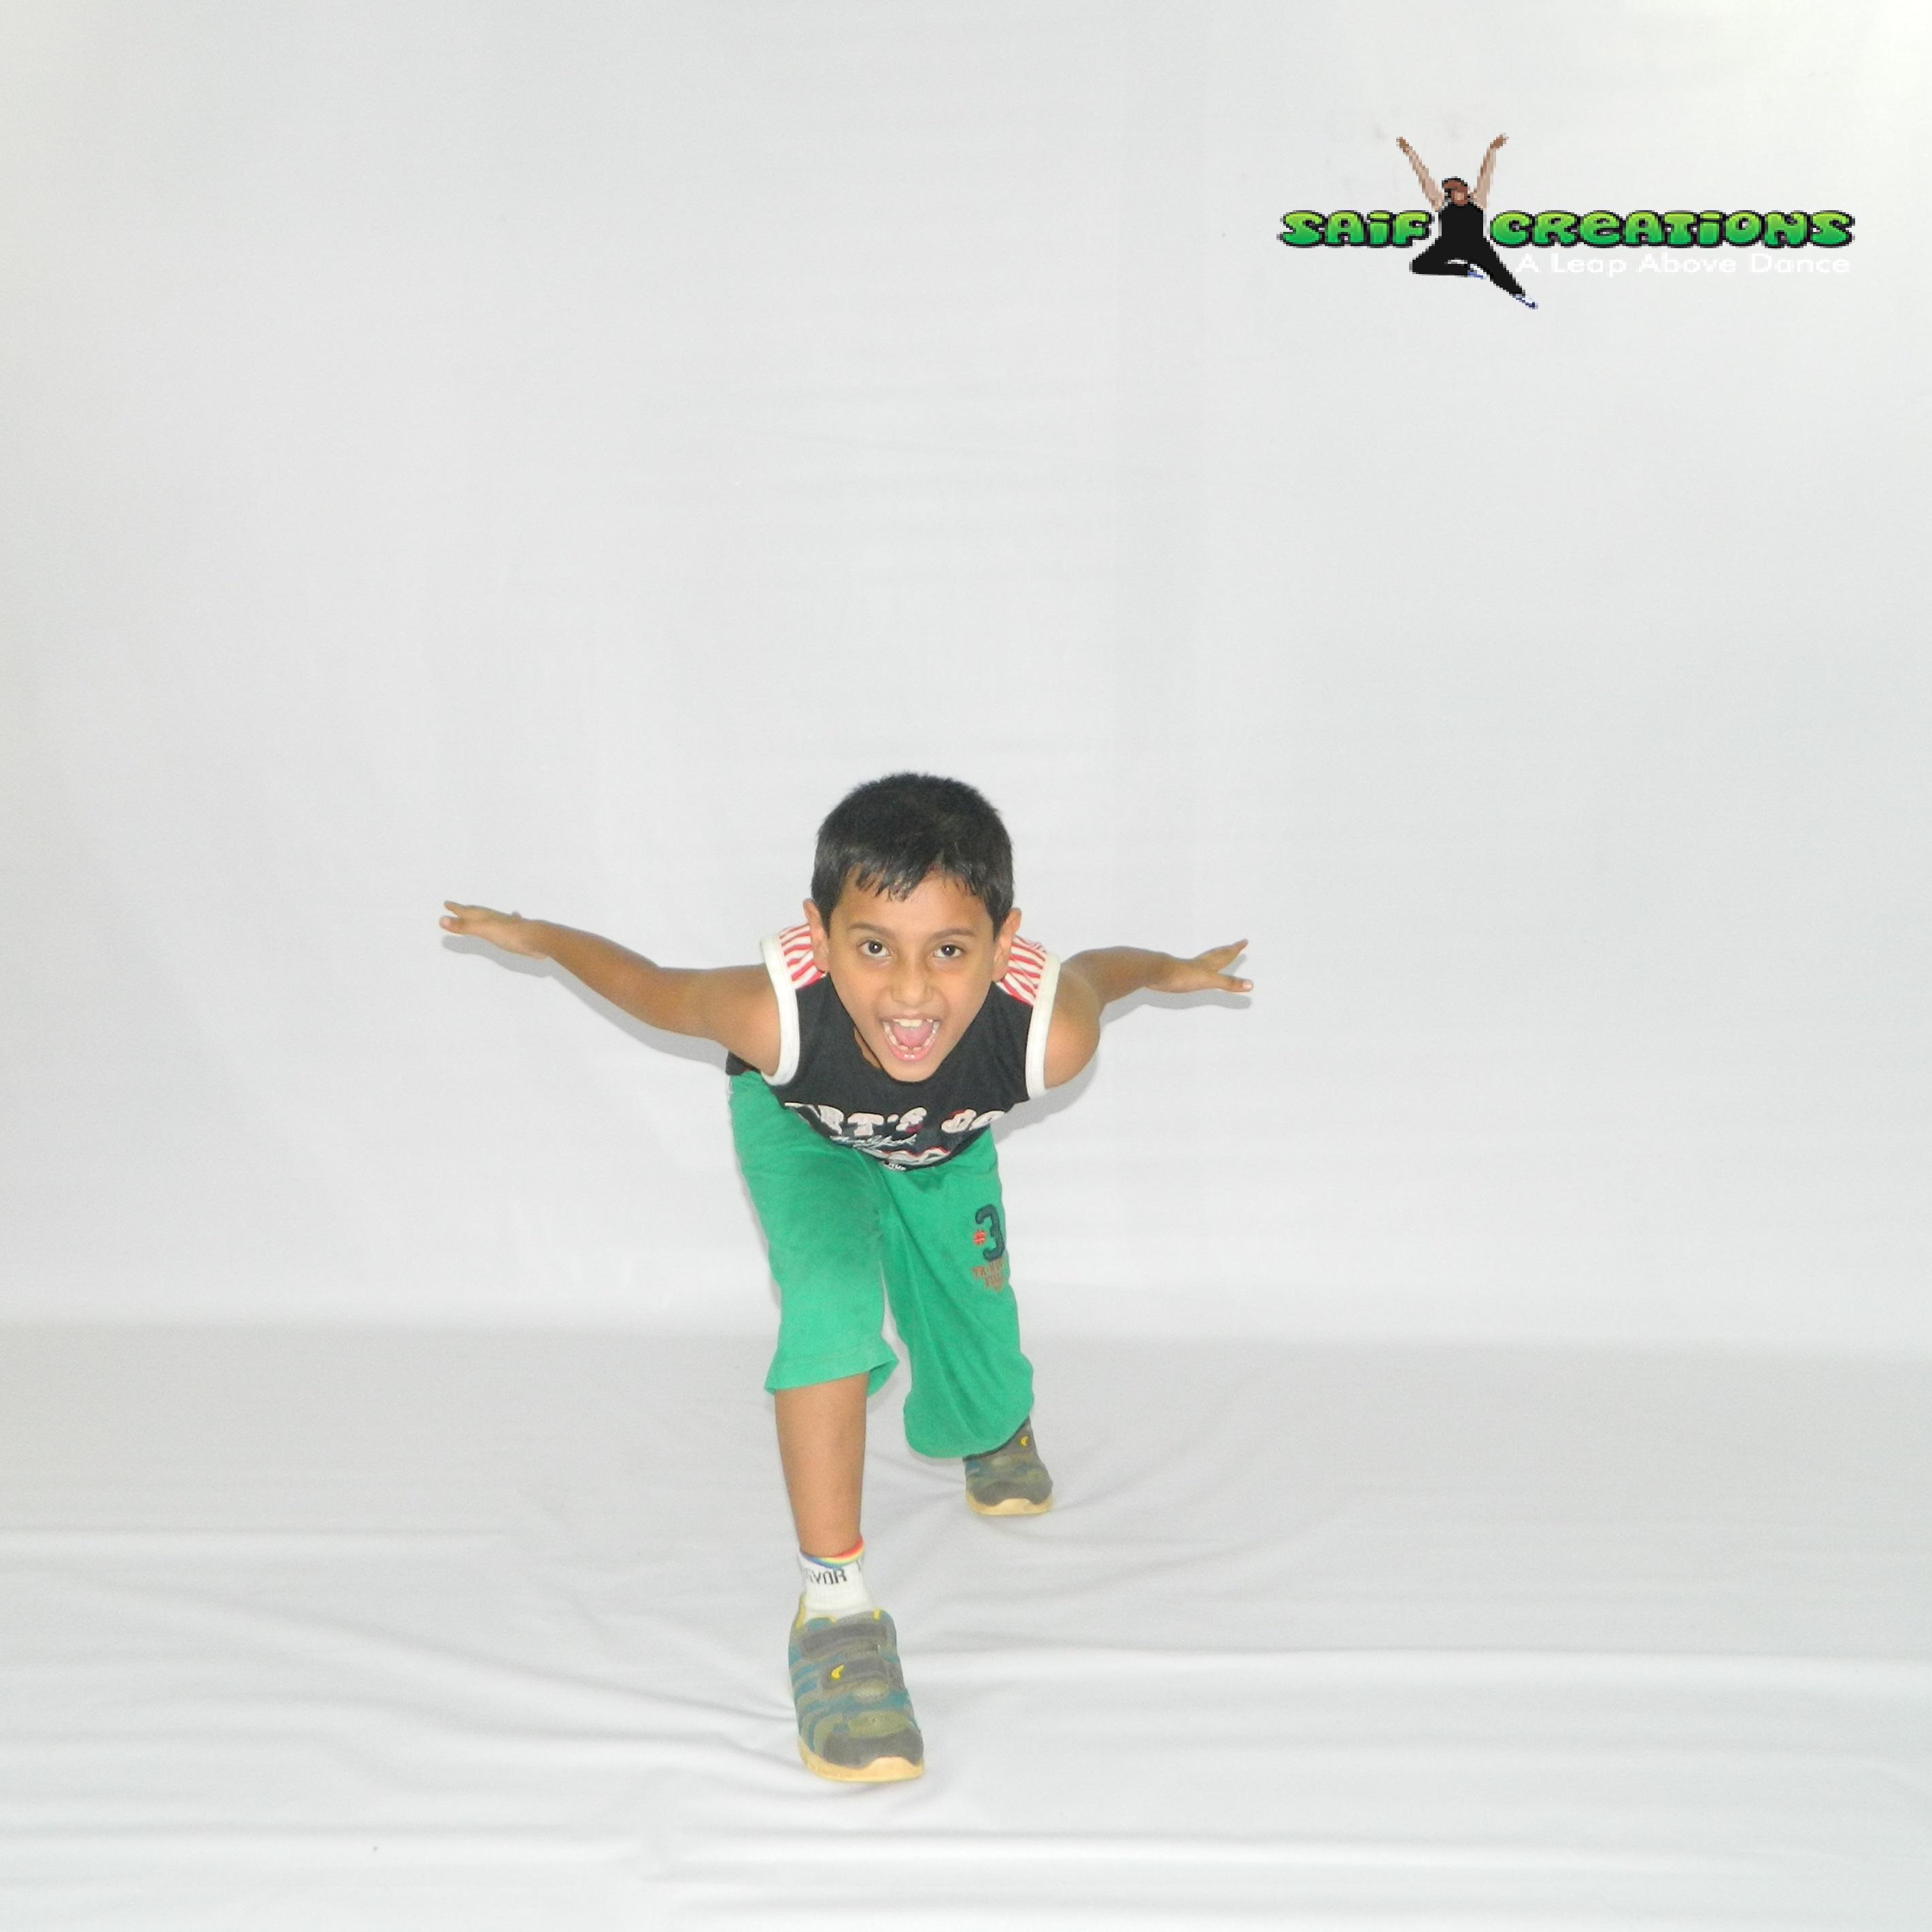 Saif Creations